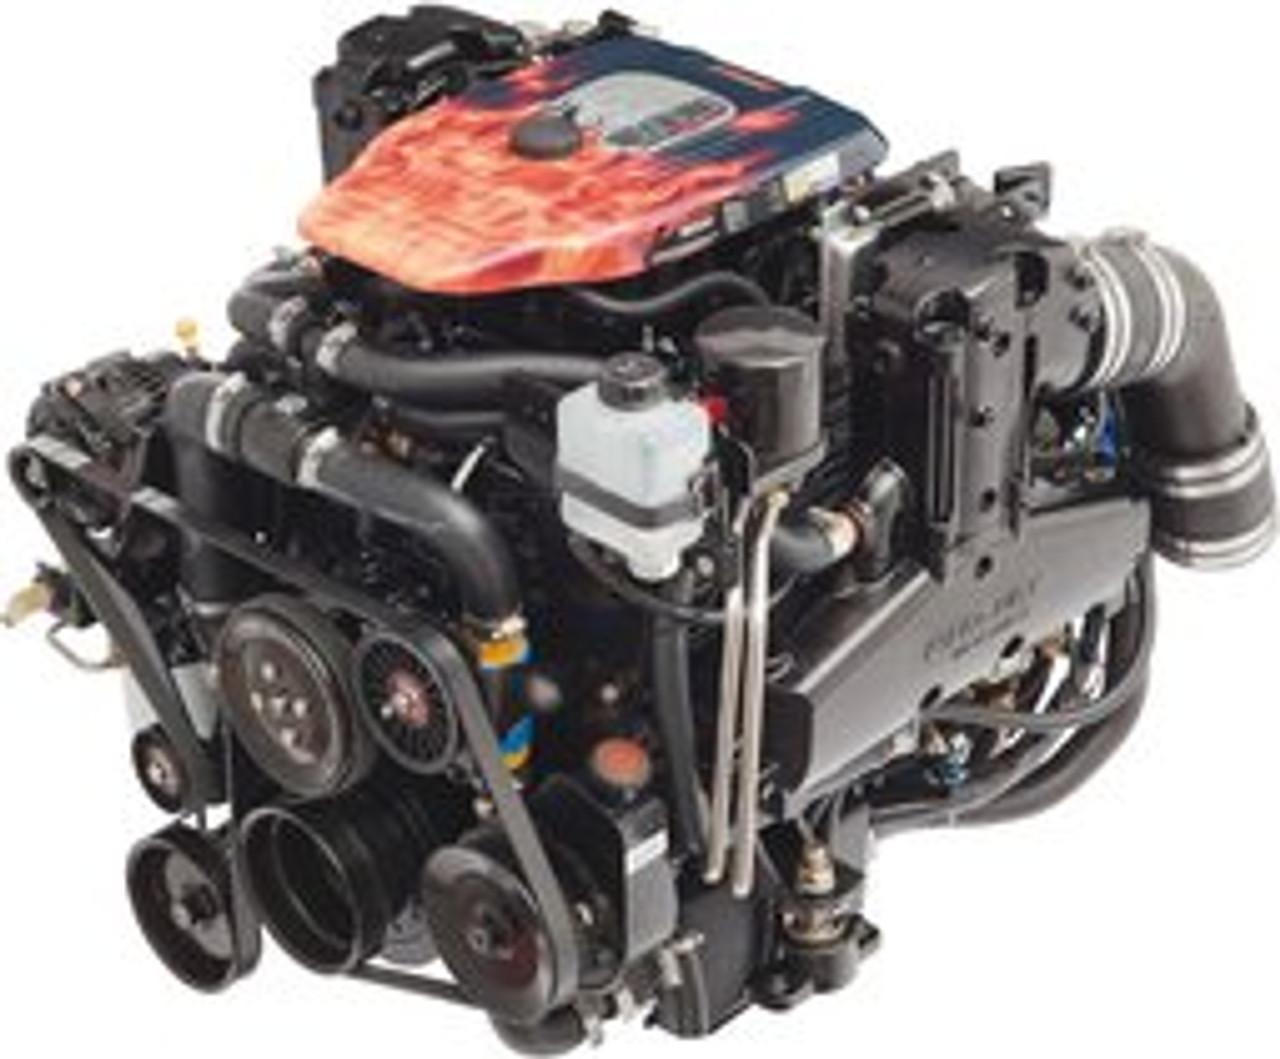 mercruiser plus series 383 mag stroker mpi bravo engine 350 hp 714 865108r80 [ 1280 x 1059 Pixel ]